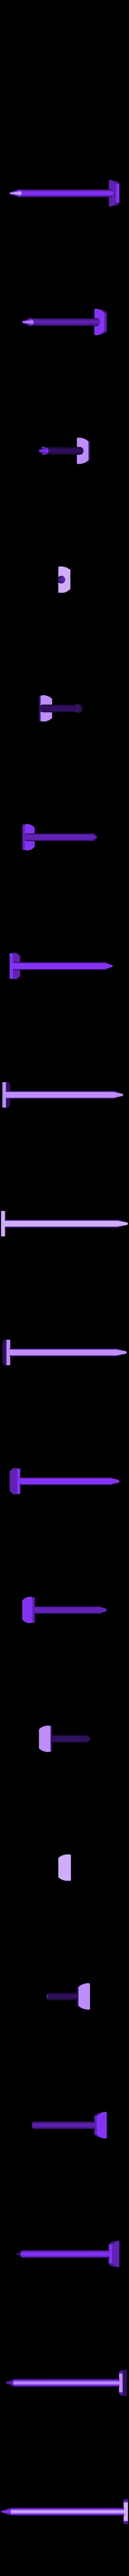 Caulk_Tube_Nail_Plug_-_Horz.stl Download free STL file Caulk Tube Nail Plug • 3D printable design, Mr_Tantrum